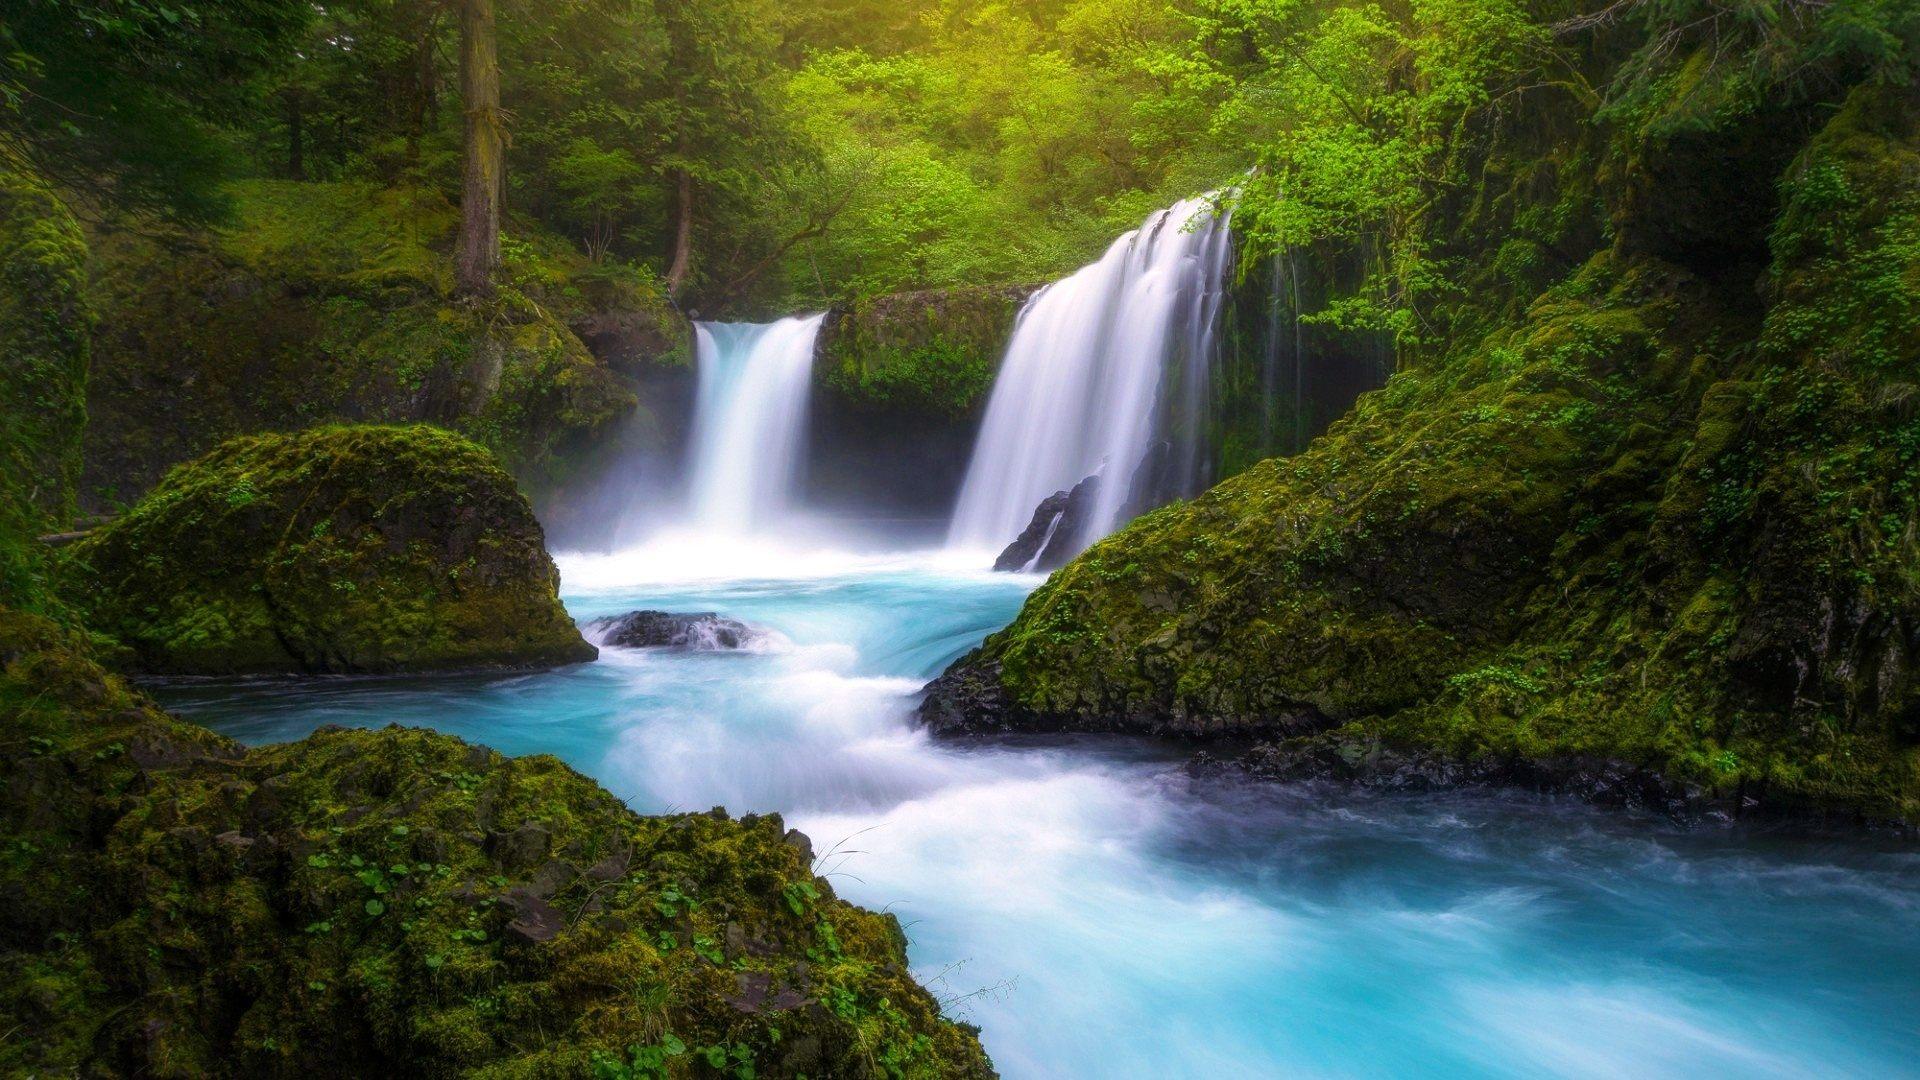 Green Forest Waterfall HD Wallpaper